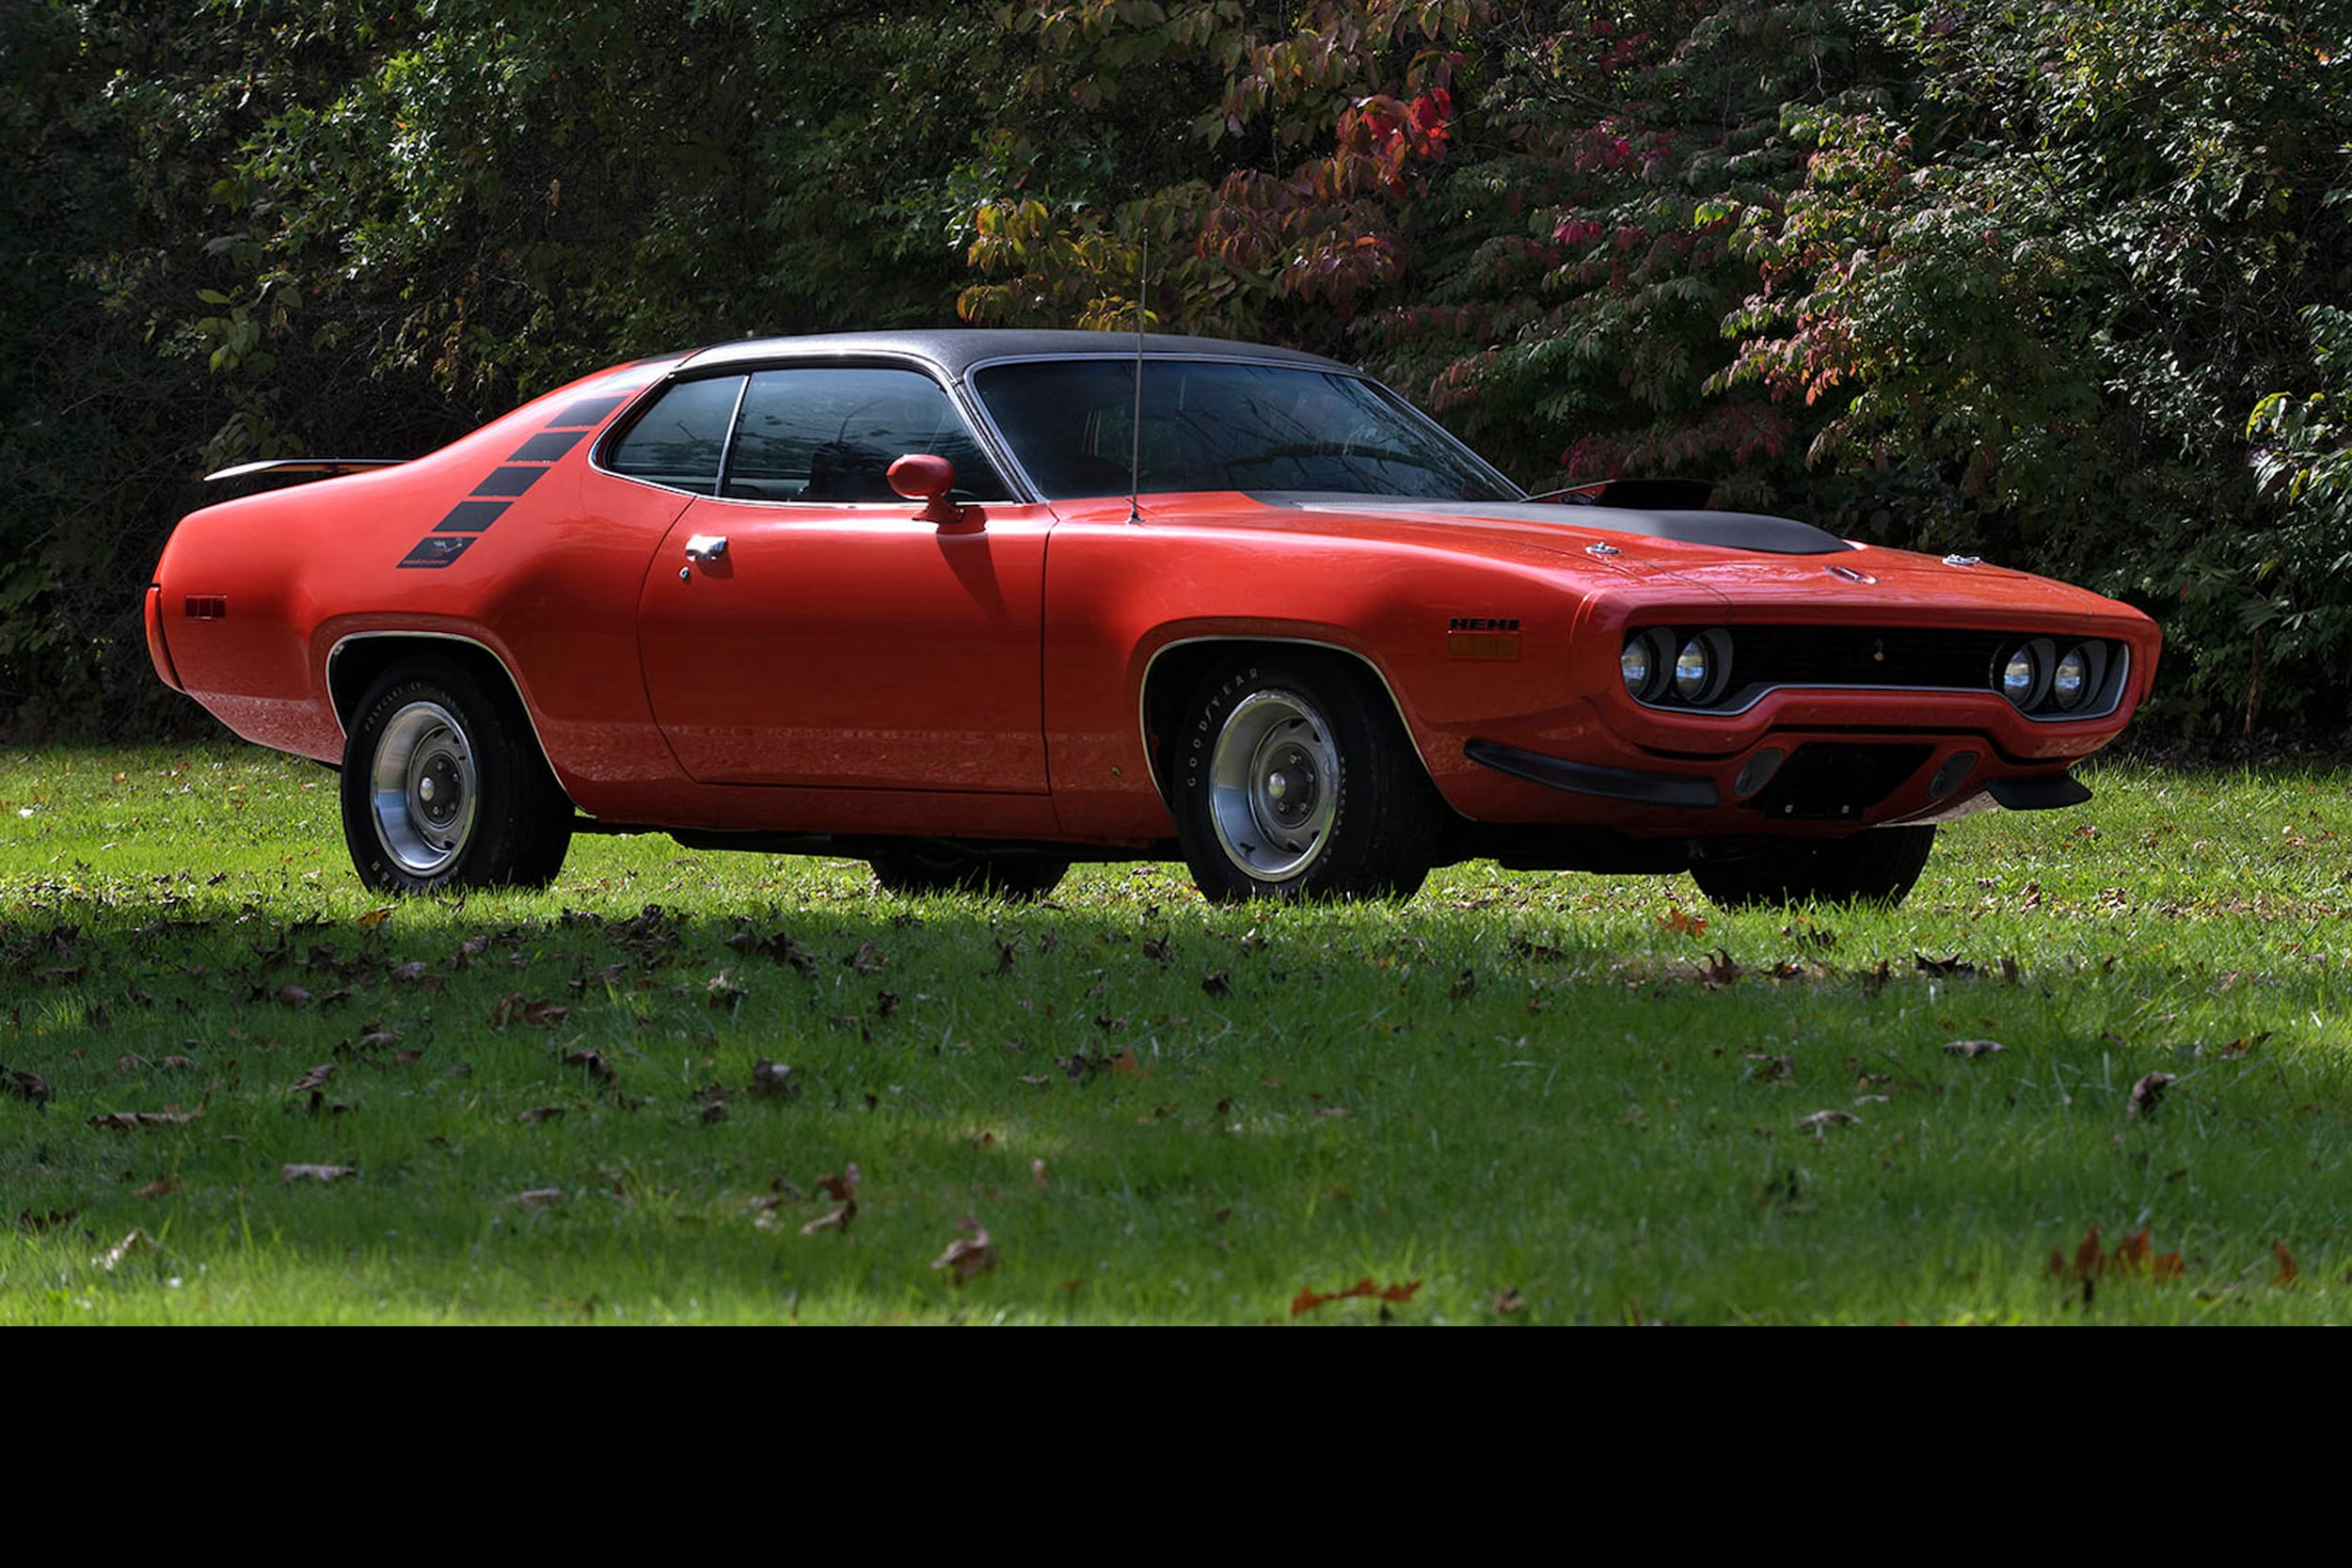 1971 PLYMOUTH HEMI ROAD RUNNER